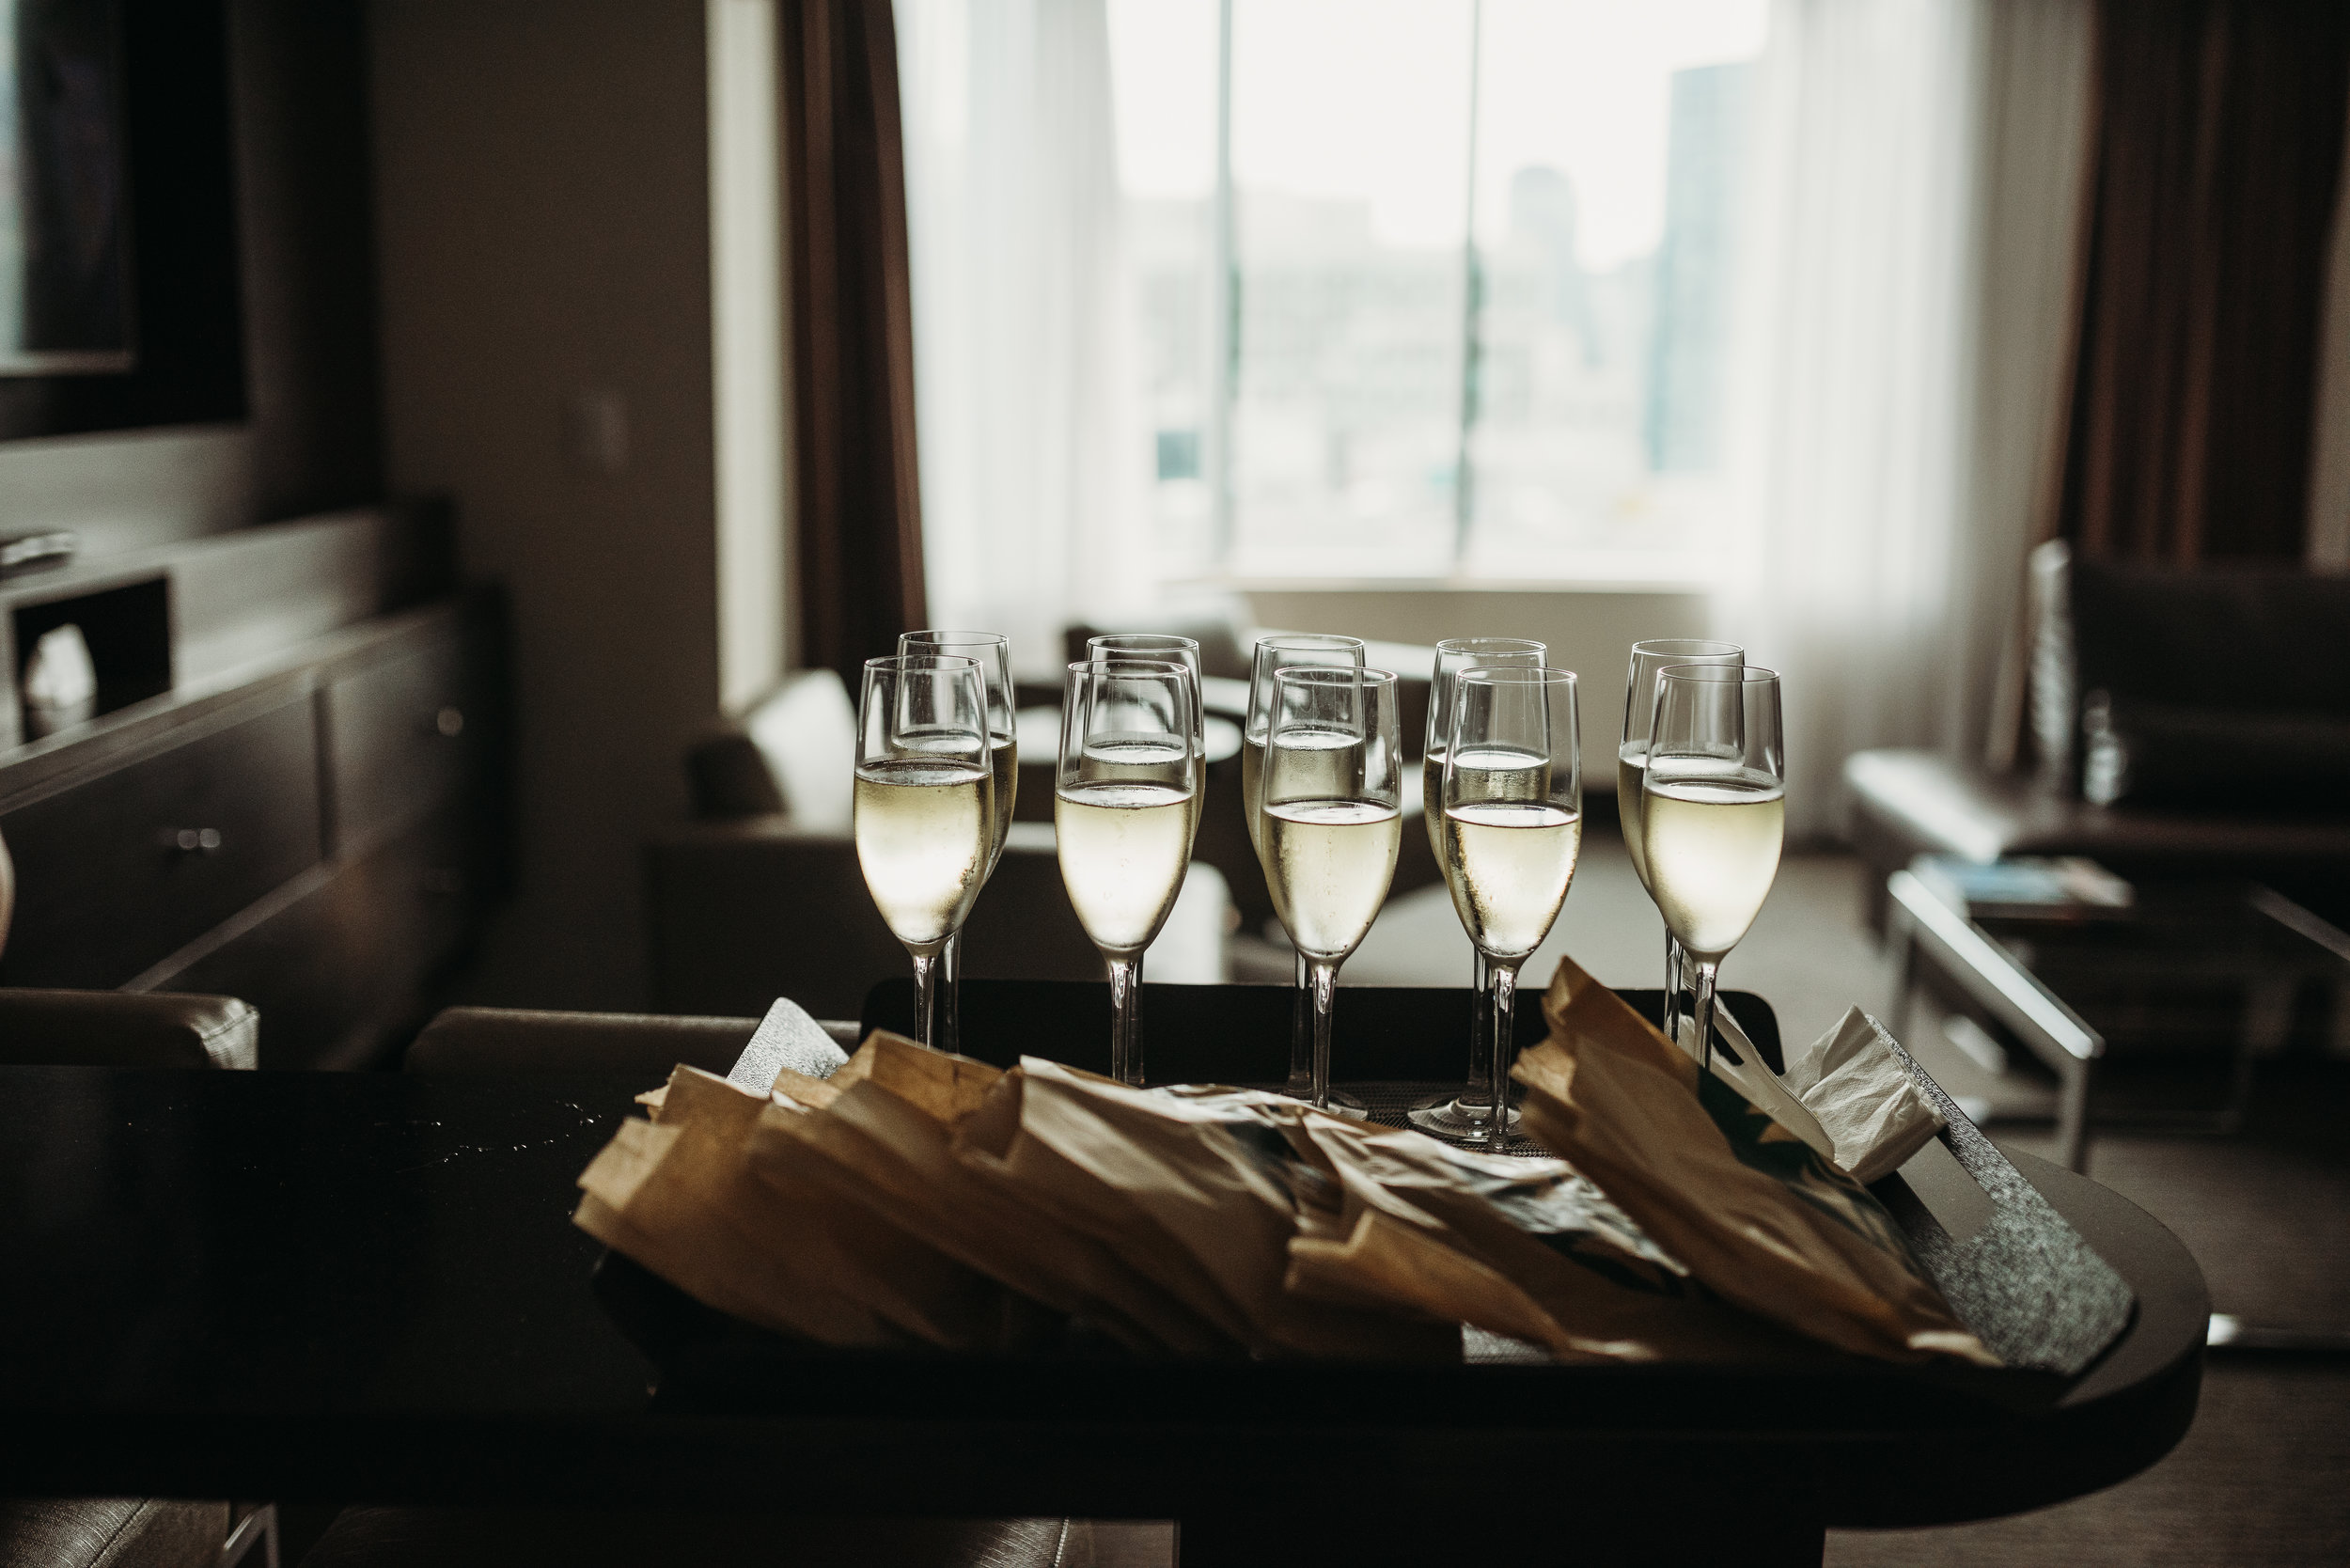 champagne-getting-ready-photos-toronto-rustic-boho-airship37-wedding-by-willow-birch-photo-toronto-documentary-wedding-photographers.jpg